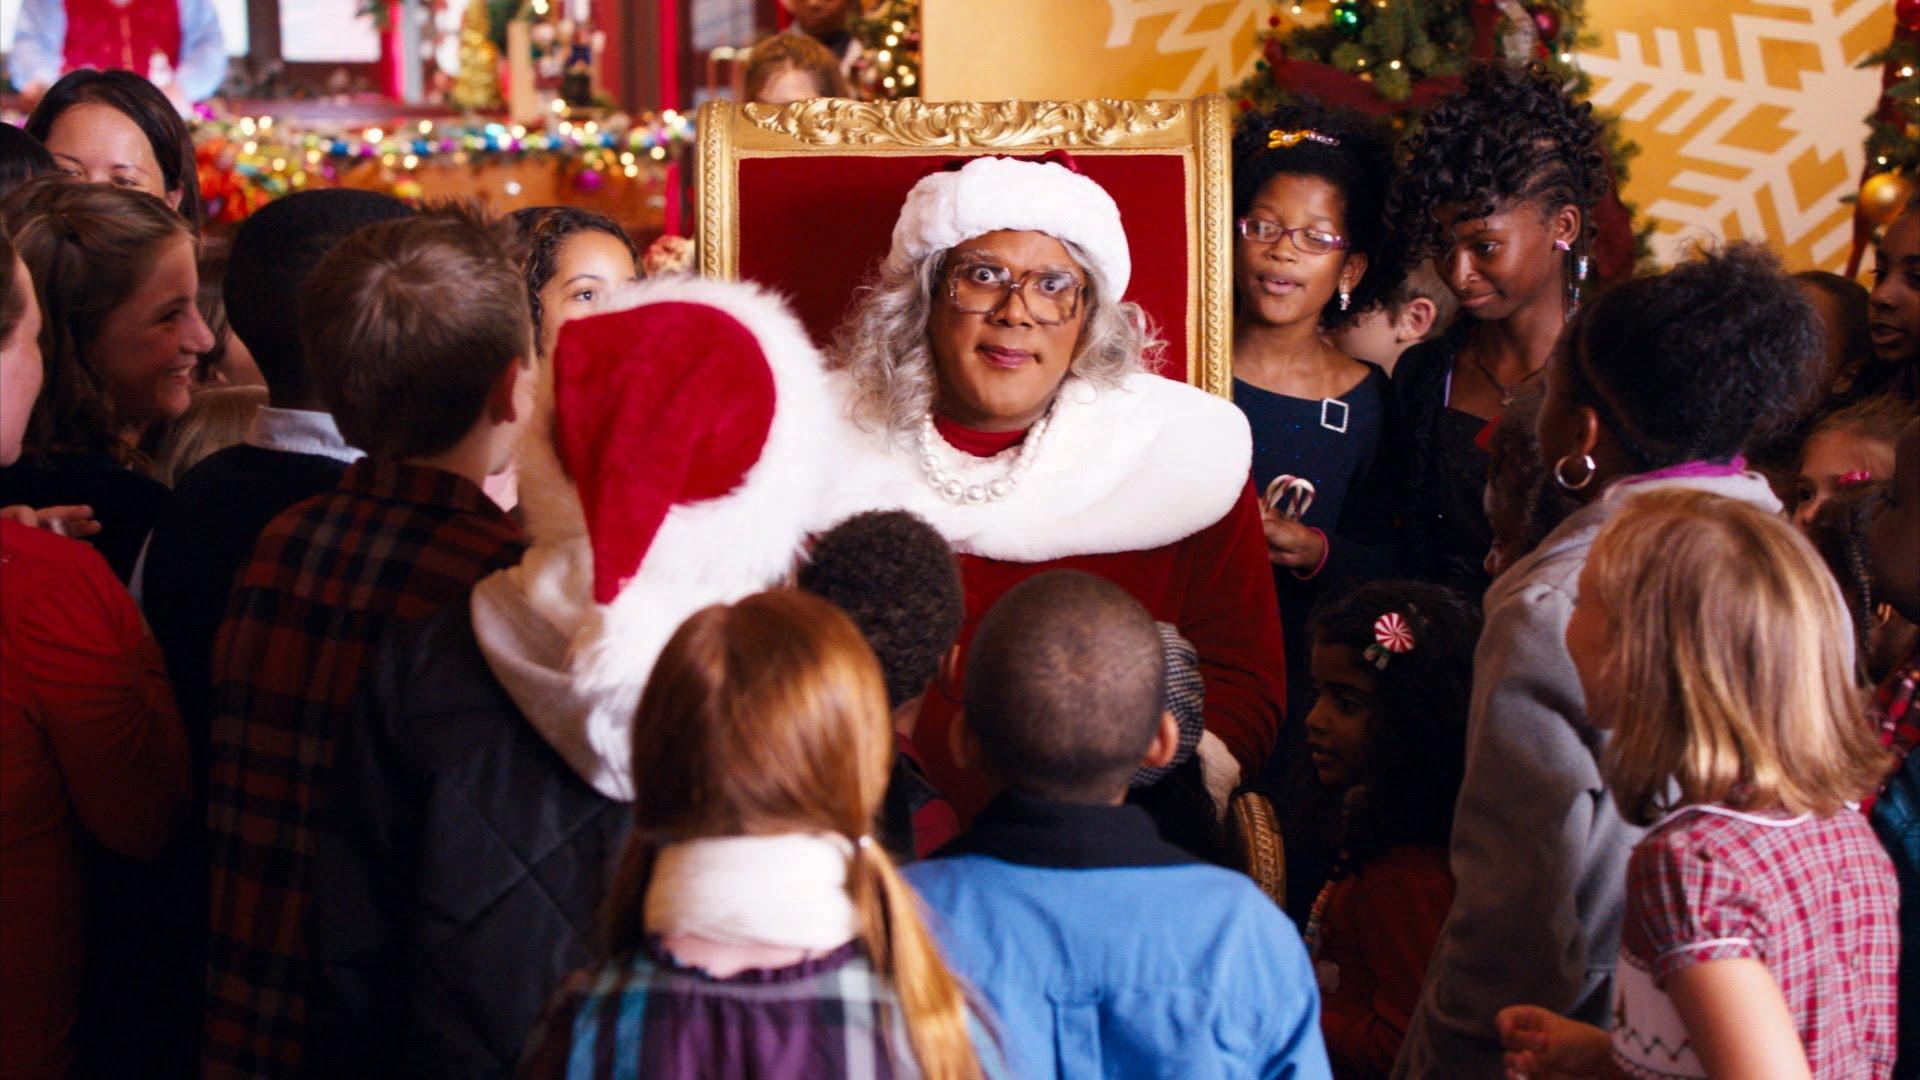 a madea christmas 2 - Madea Christmas Play